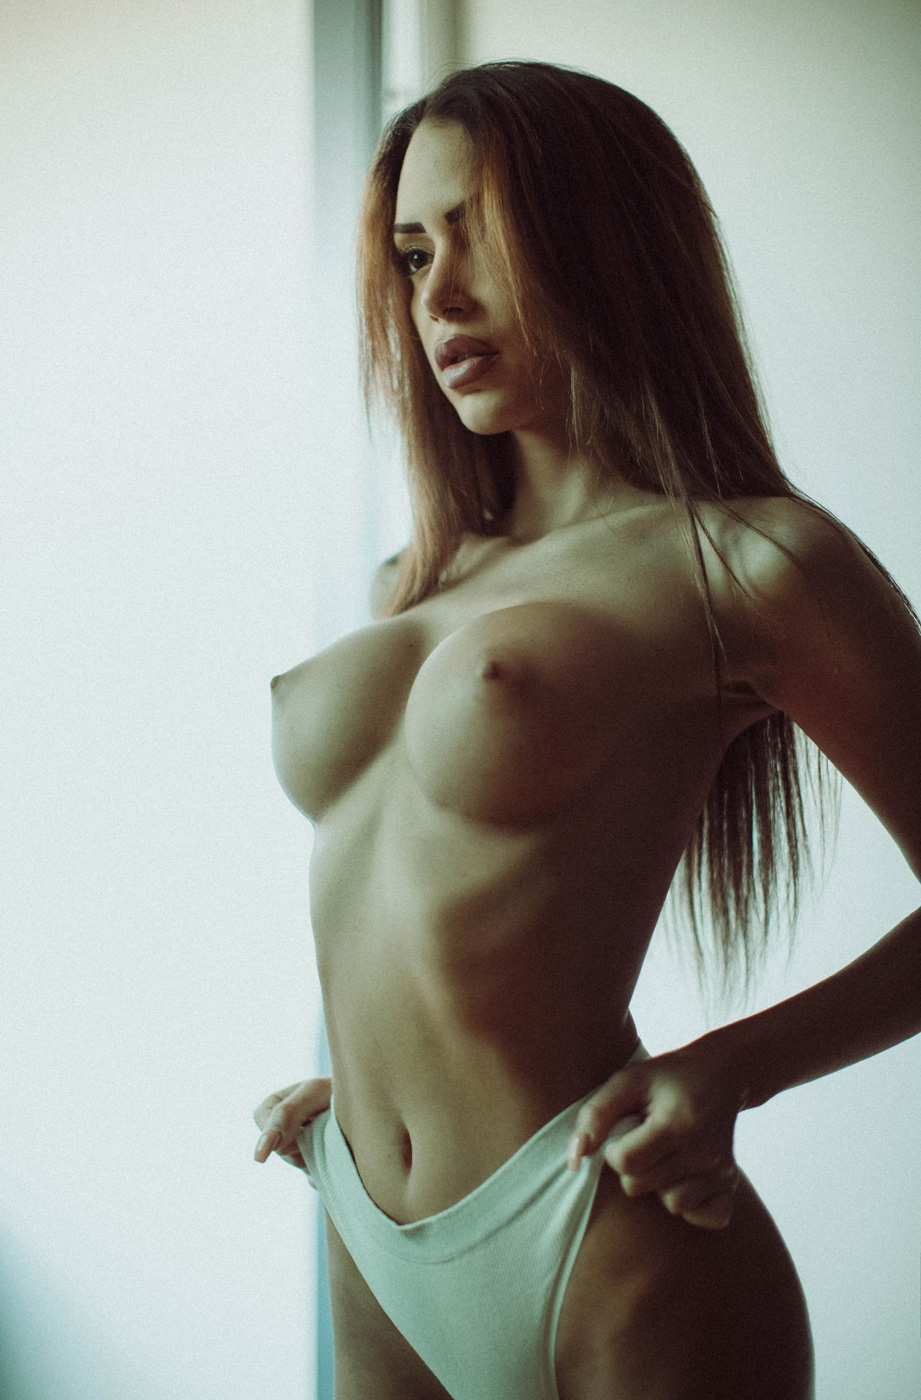 Maryannax nude Nude model